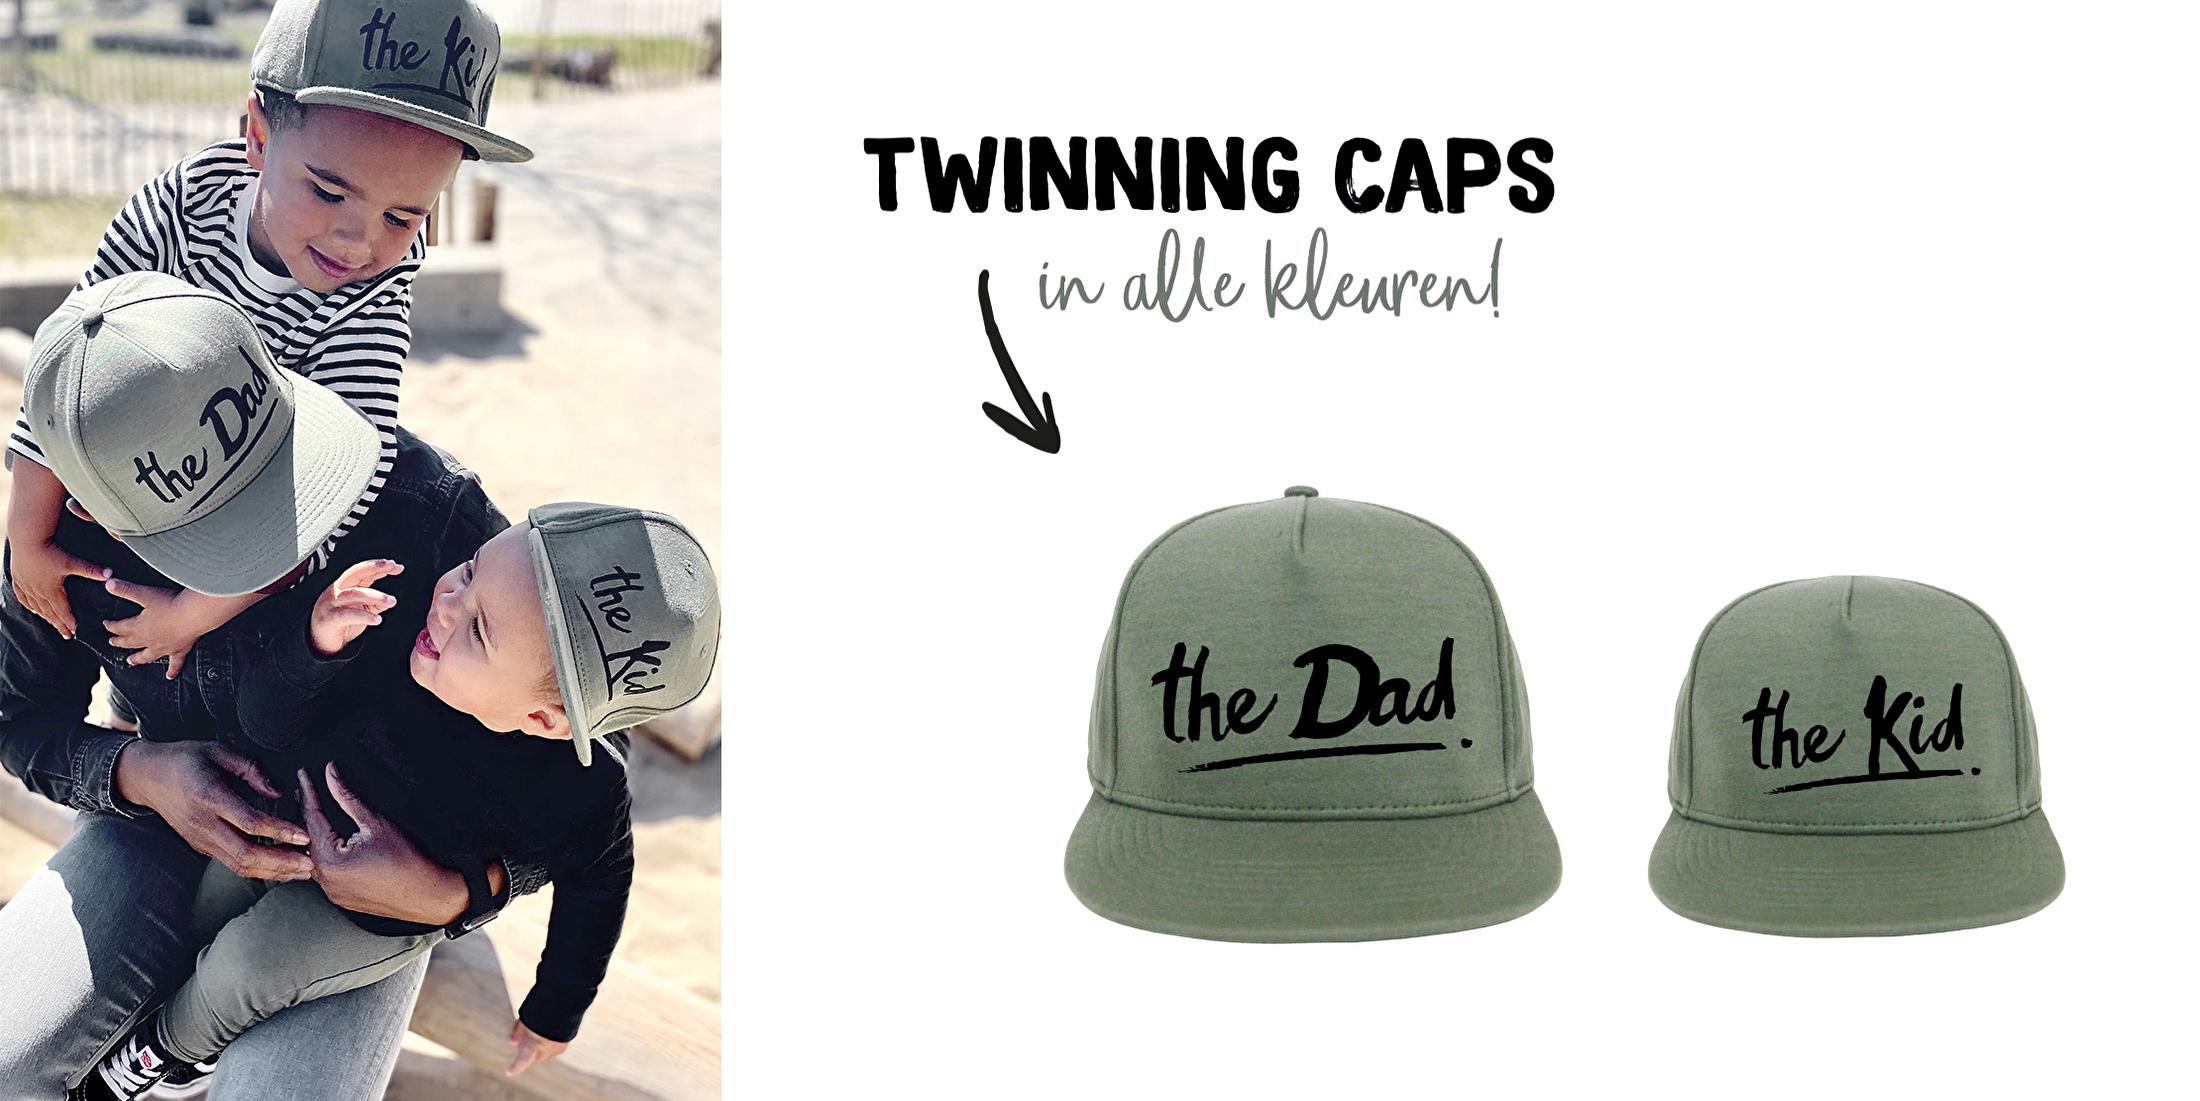 Twinning Caps